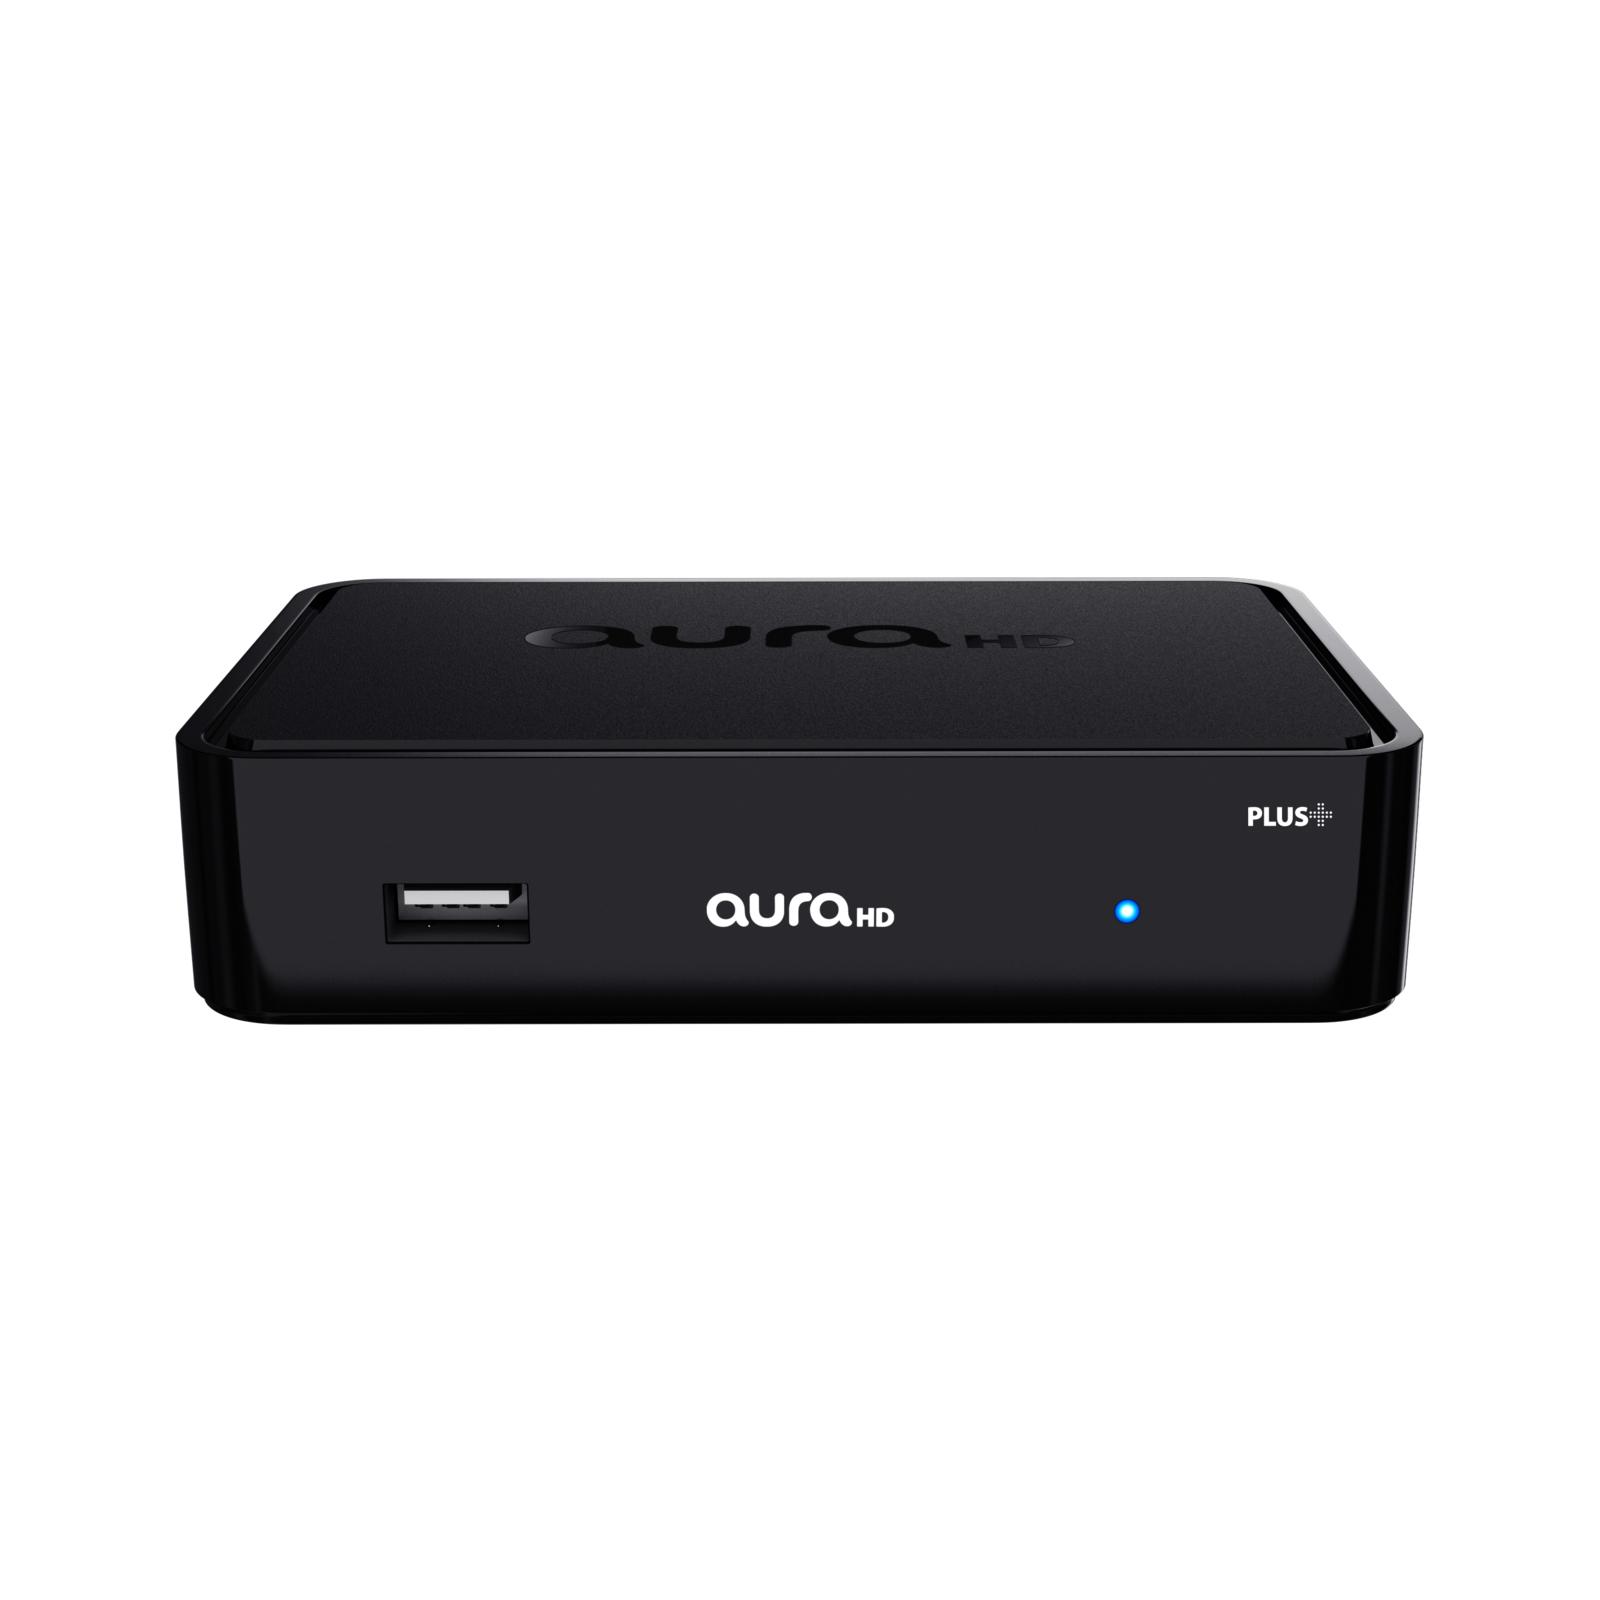 Медиаплеер Aura HD Plus WiFi T2 (Aura HD Plus WiFi T2) изображение 3